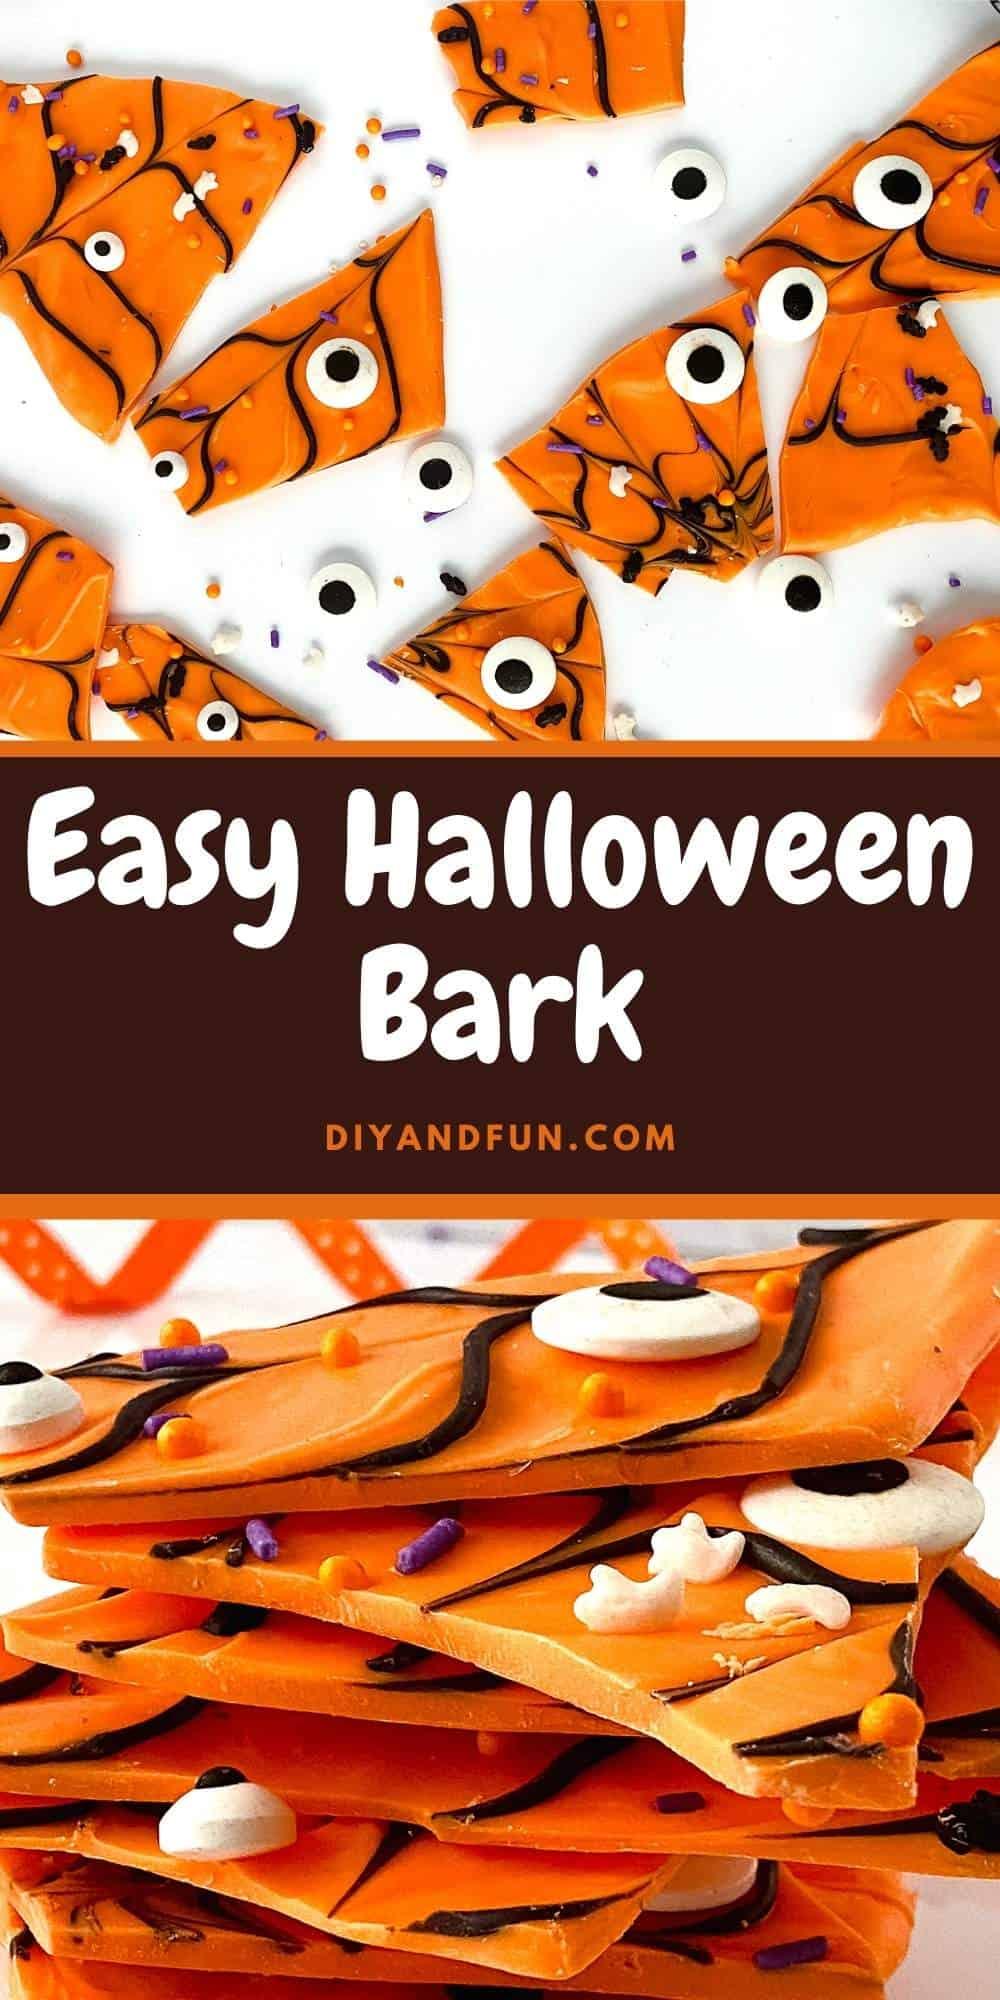 Easy Halloween Bark